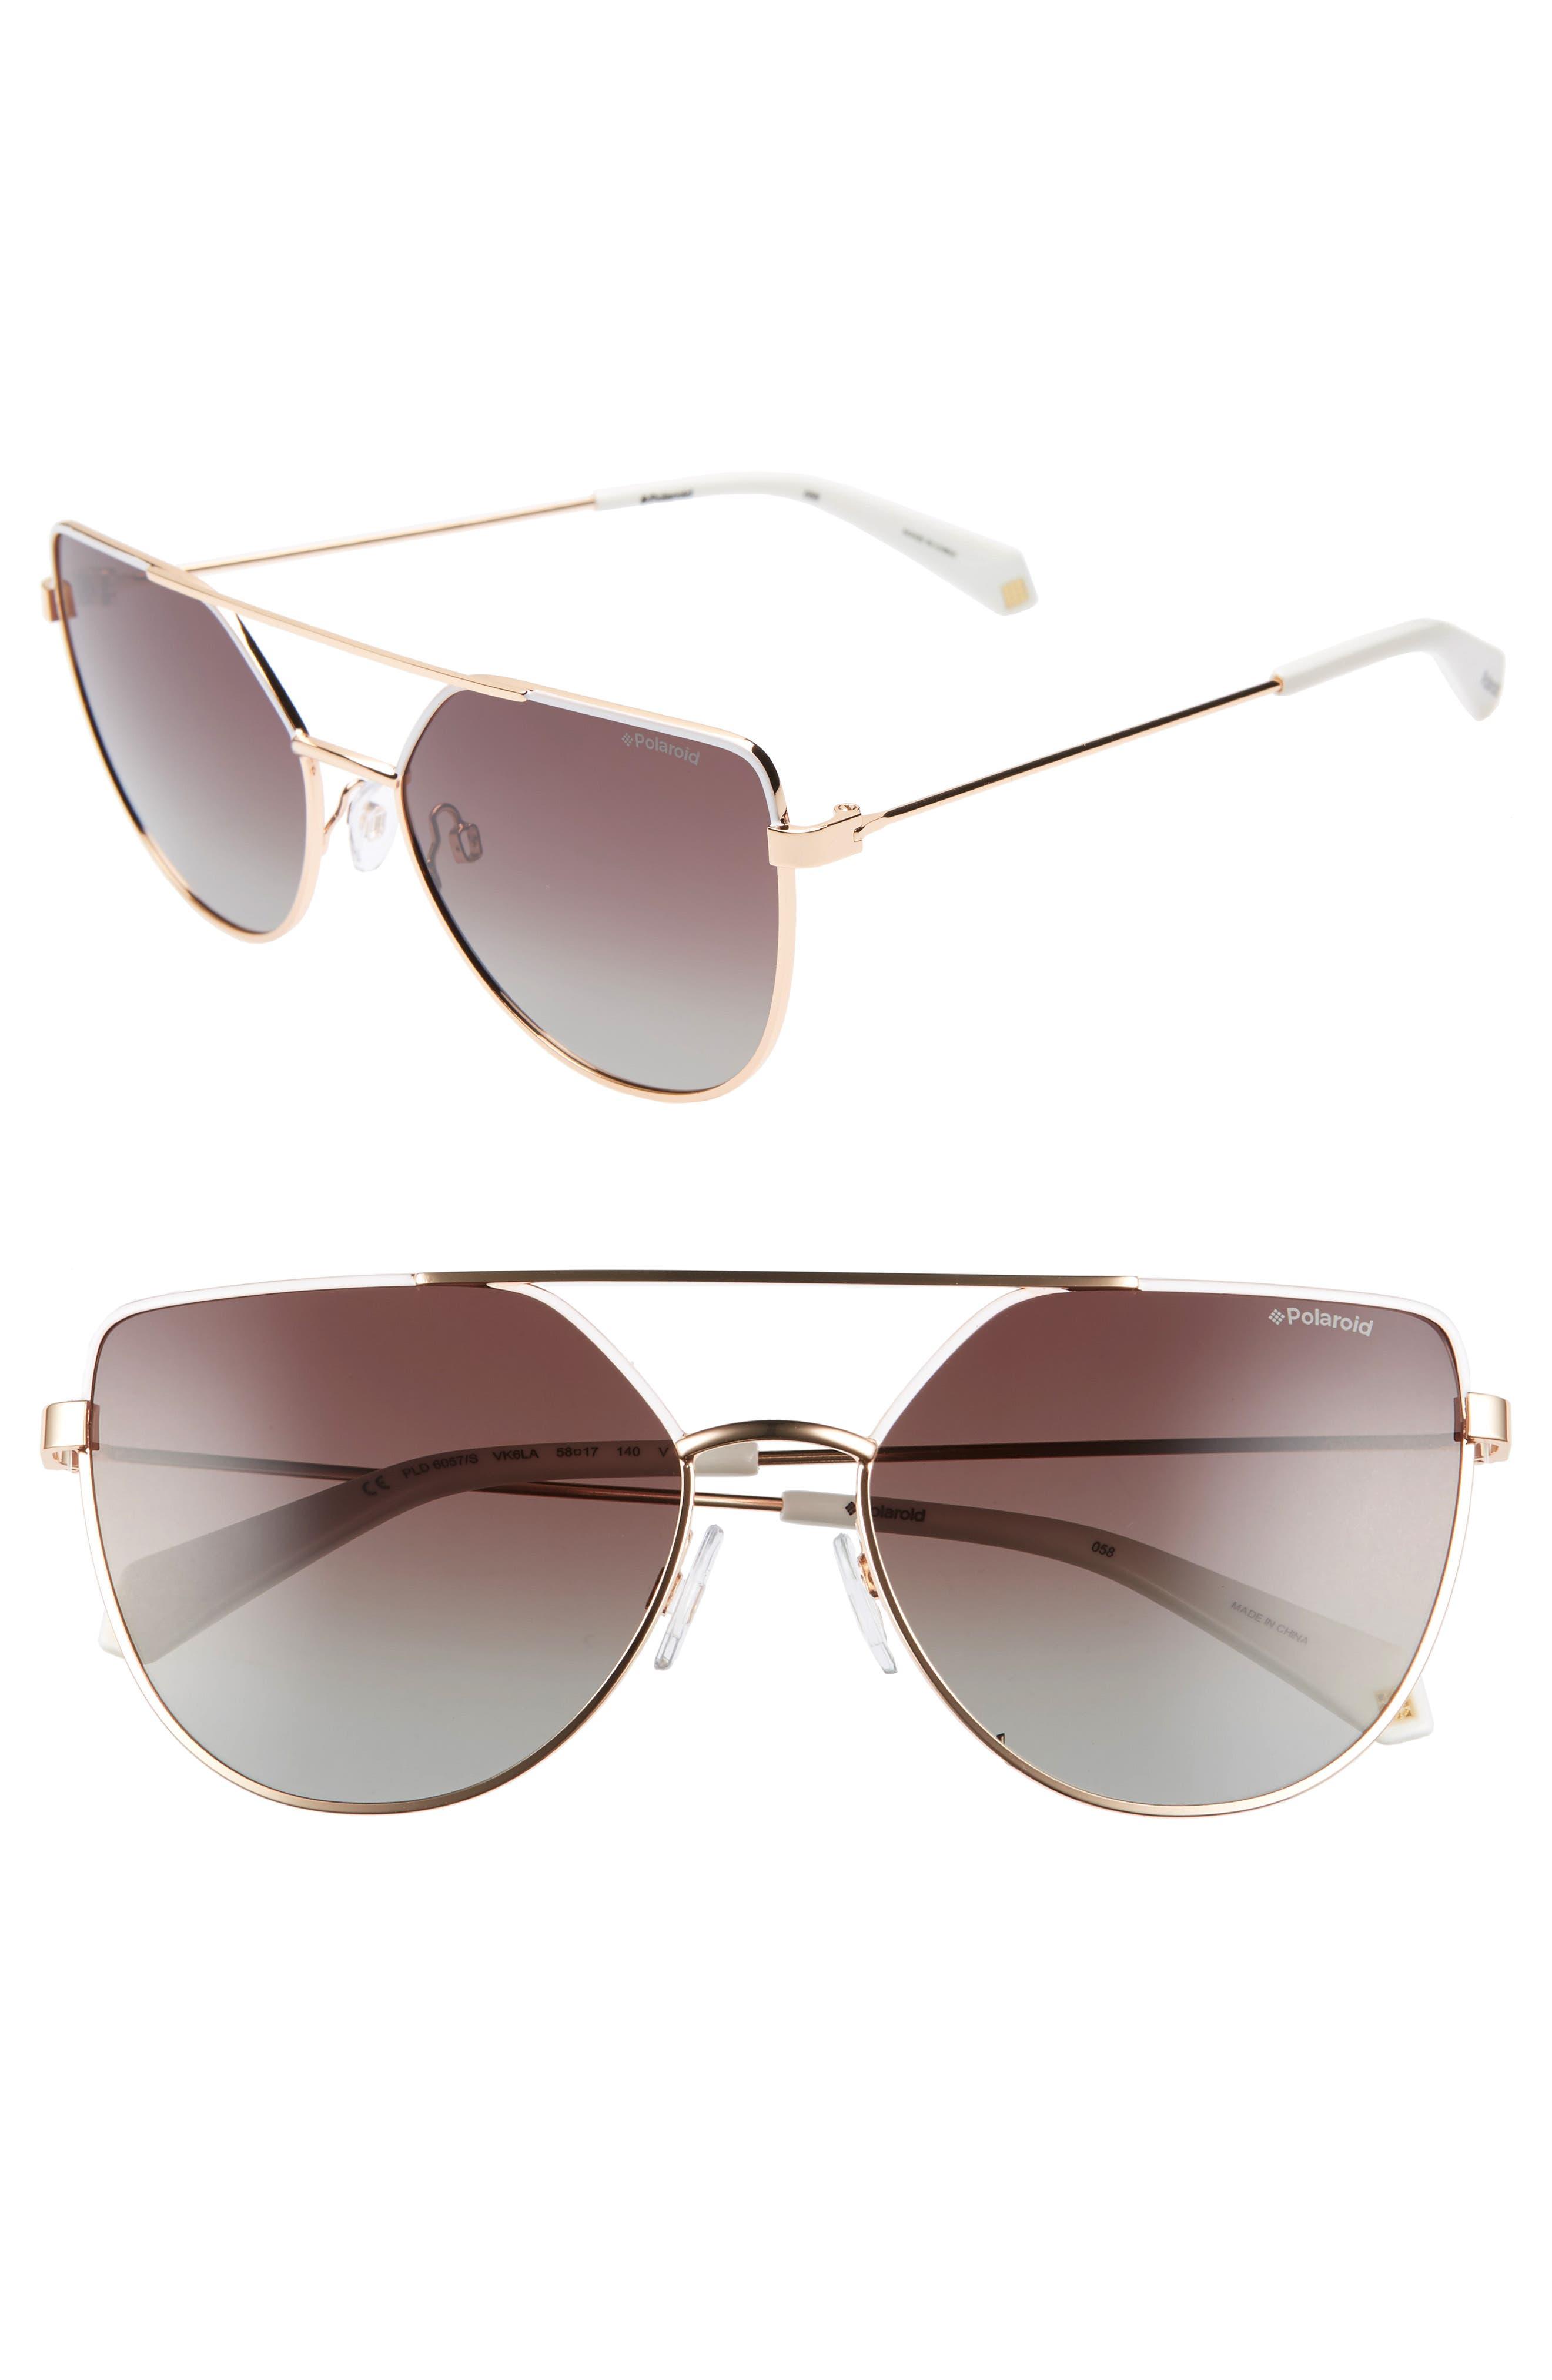 POLAROID 58Mm Polarized Sunglasses - White/ Gold